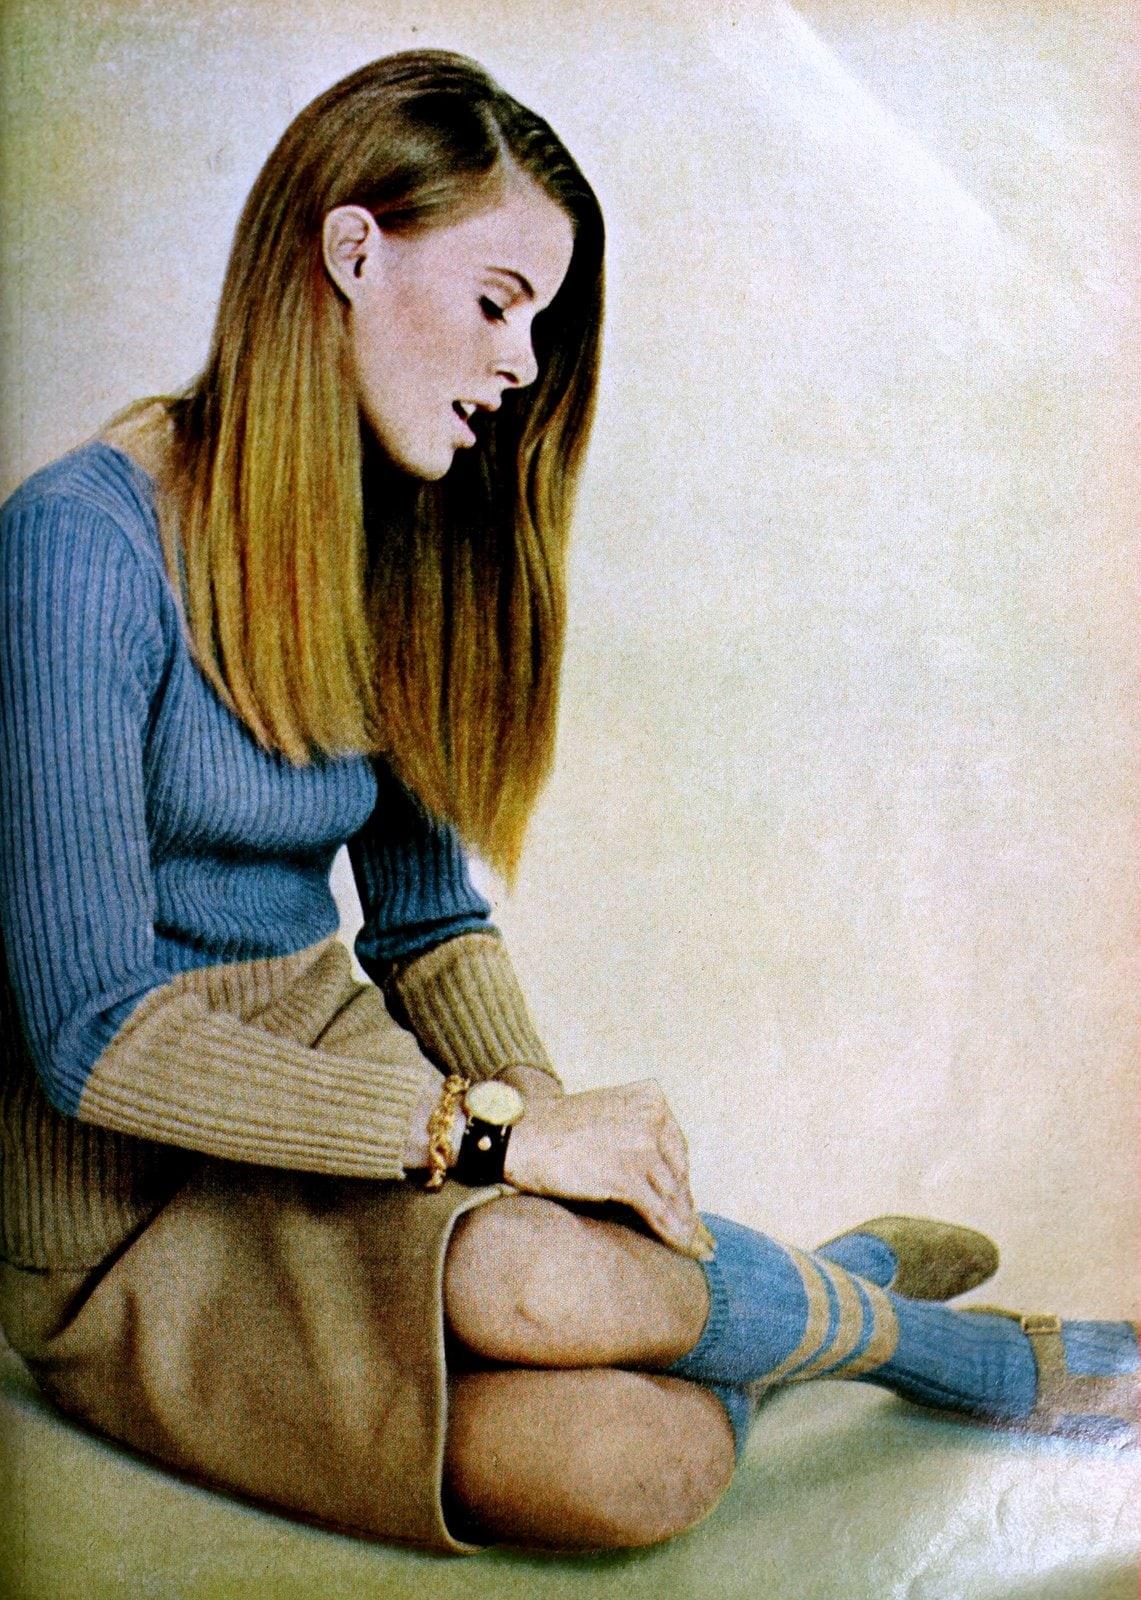 Vintage sixties beige and blue sweater dress womenswear